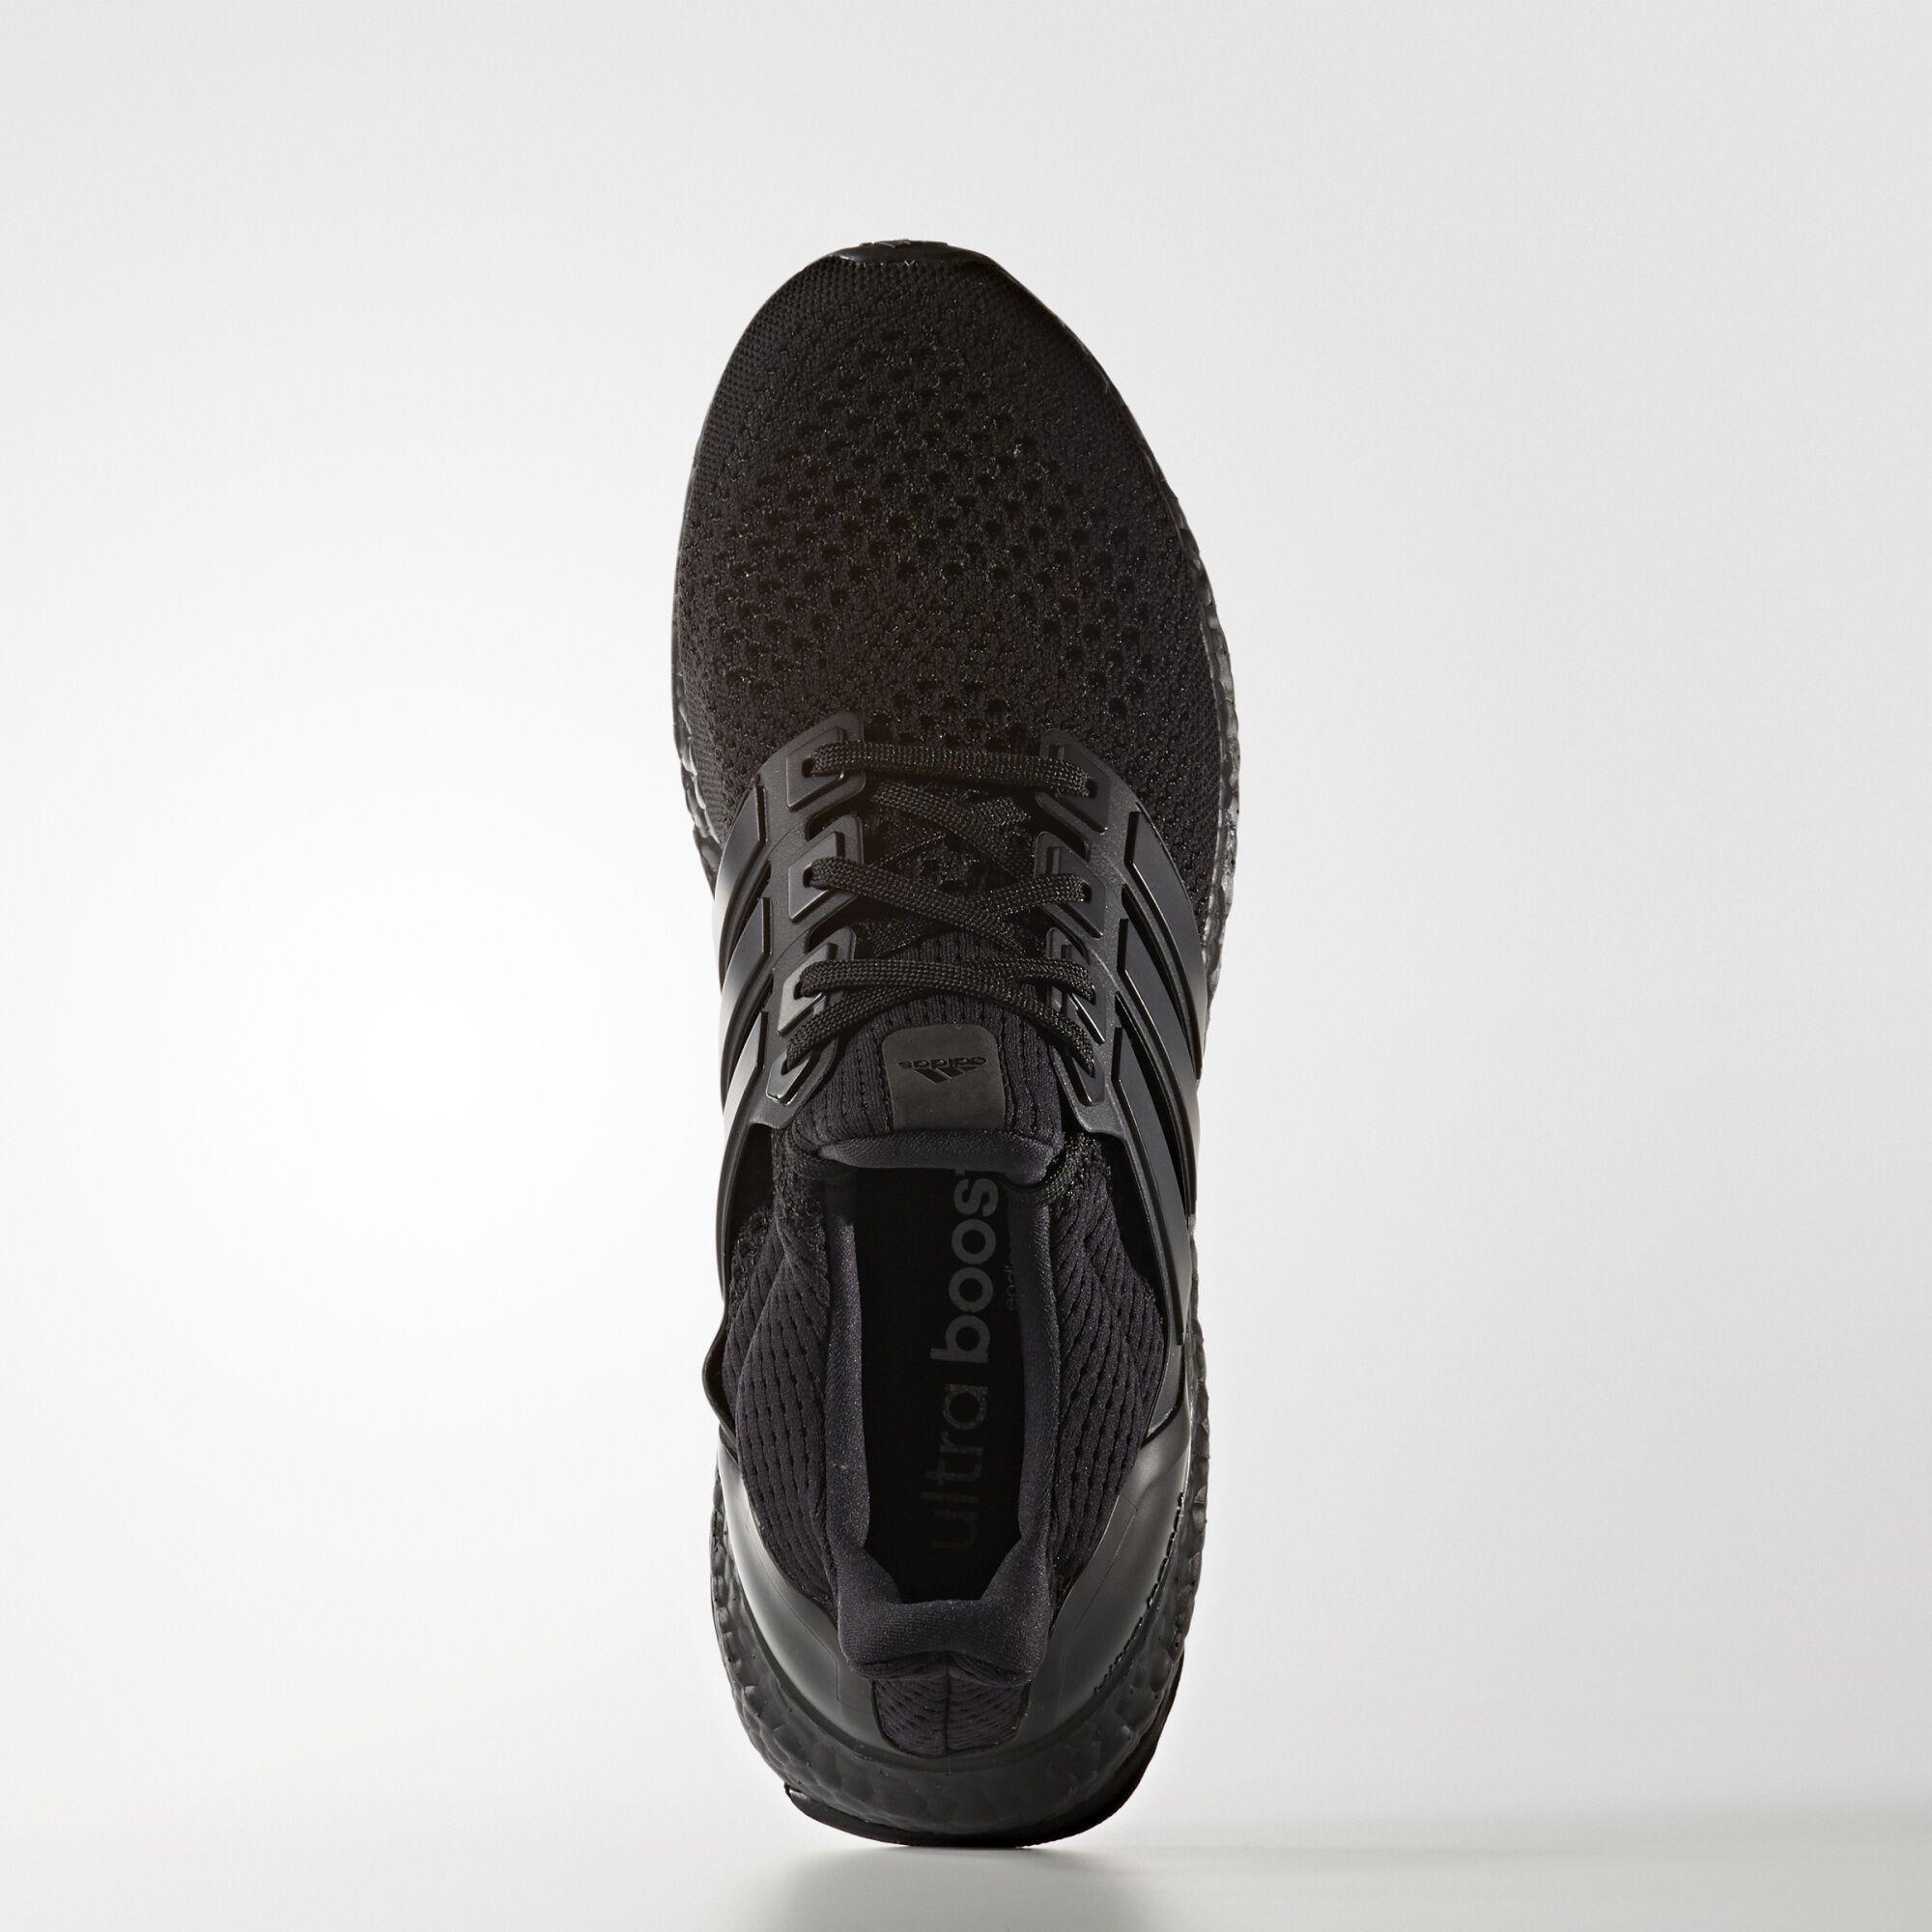 adidas  Ultra Boost Ltd  Triple Black  CW  Core Black Core Black Core Black  SKU  BB4677 Release  12.01.16. Retail   200 9dc2ee411